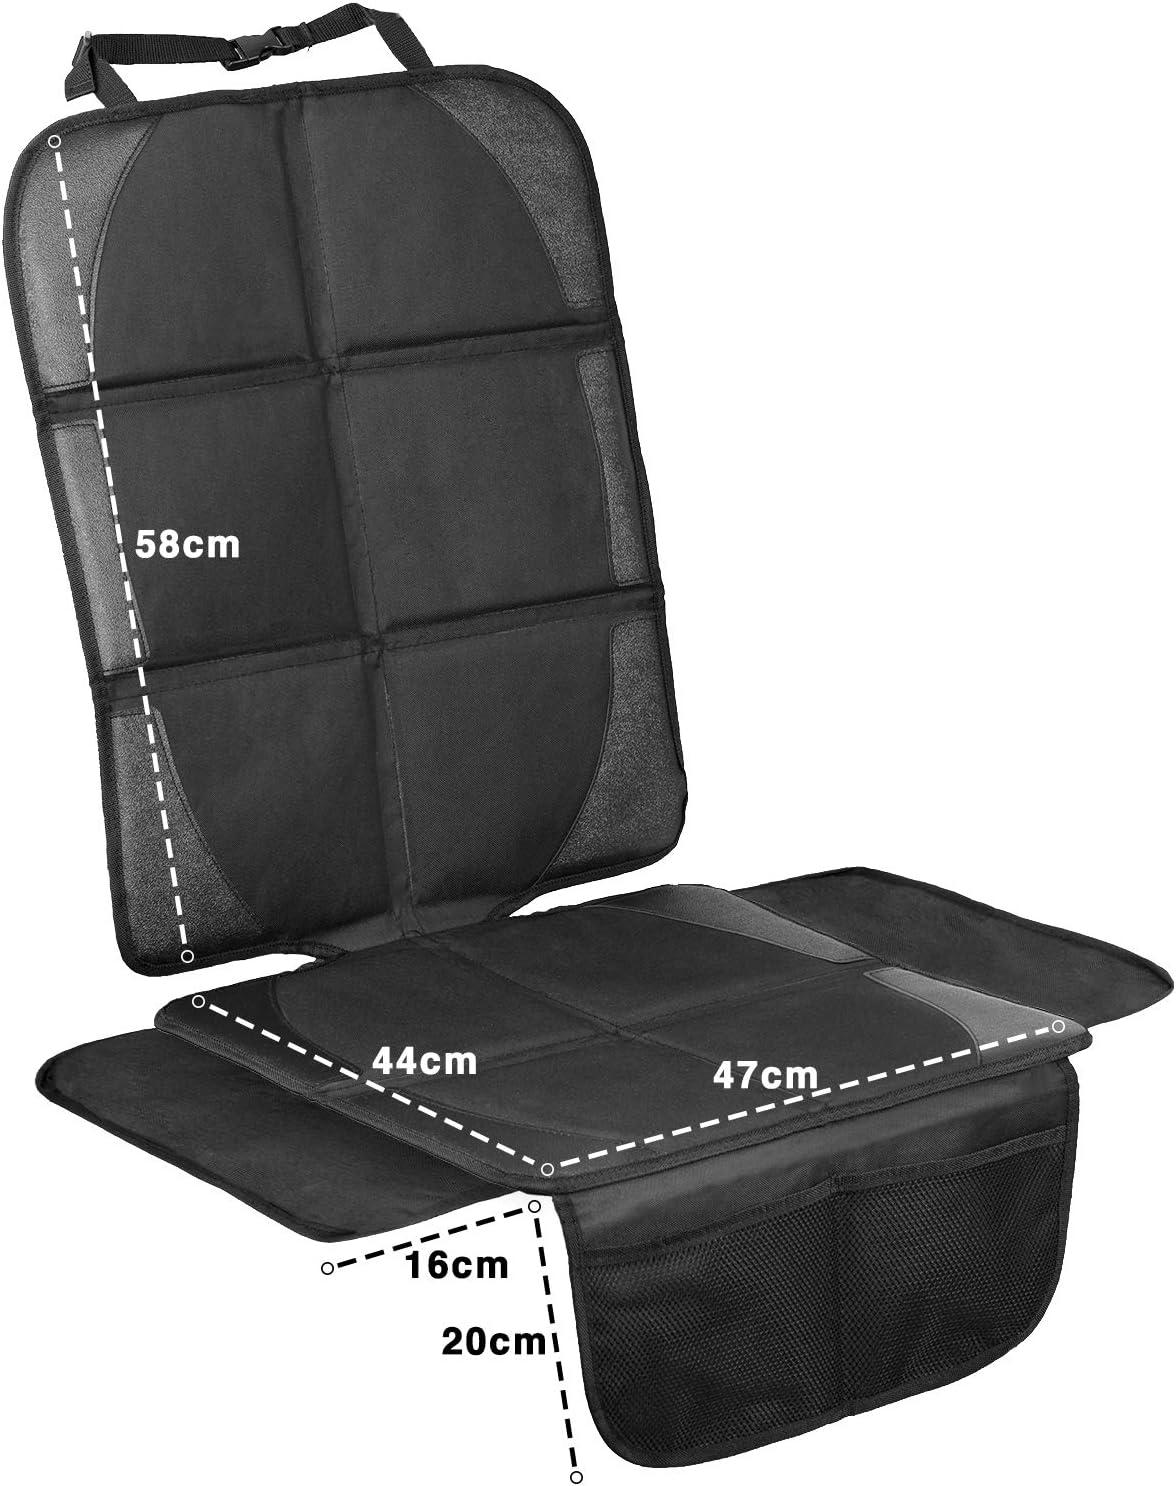 2-SET ISOFIX Fundas para sillas de coche Protector seguro para asiento infantil Protege tu coche LIONSTRONG